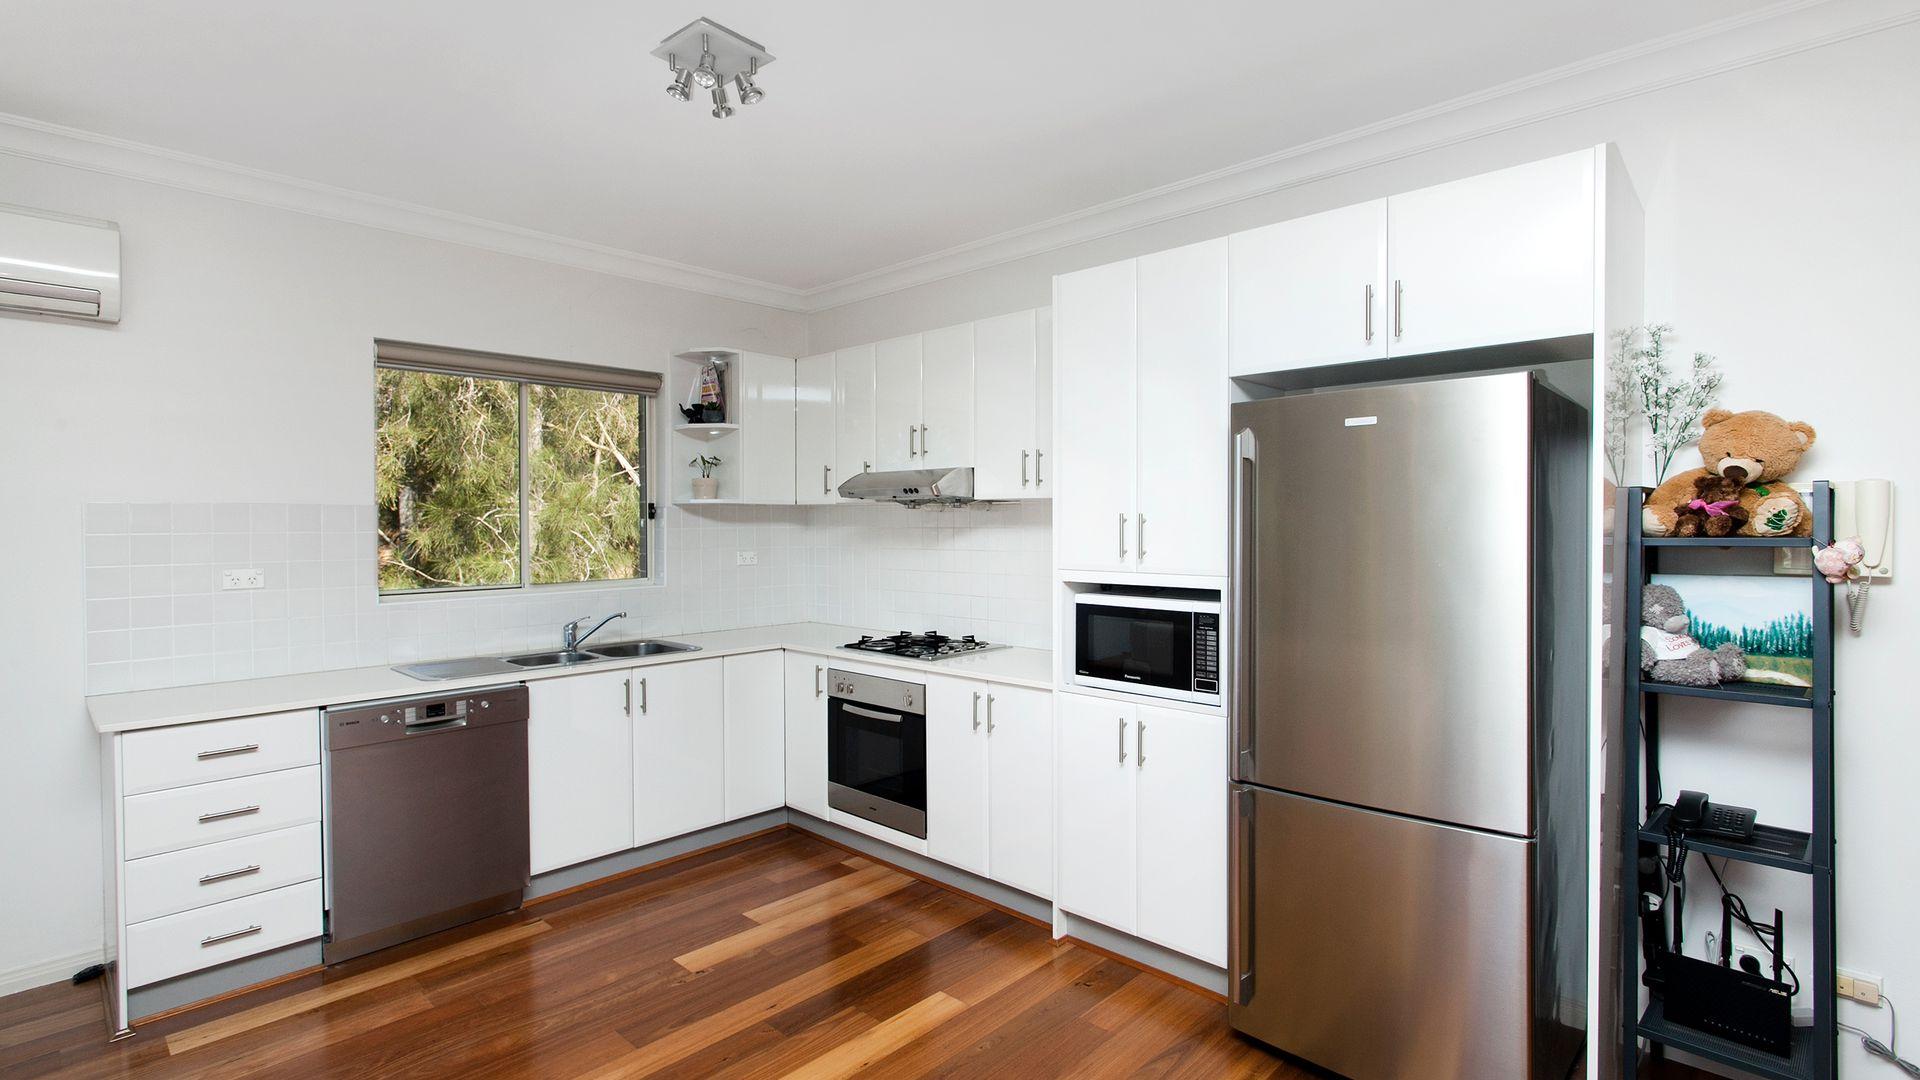 8-10 Rutland Street, Allawah NSW 2218, Image 1